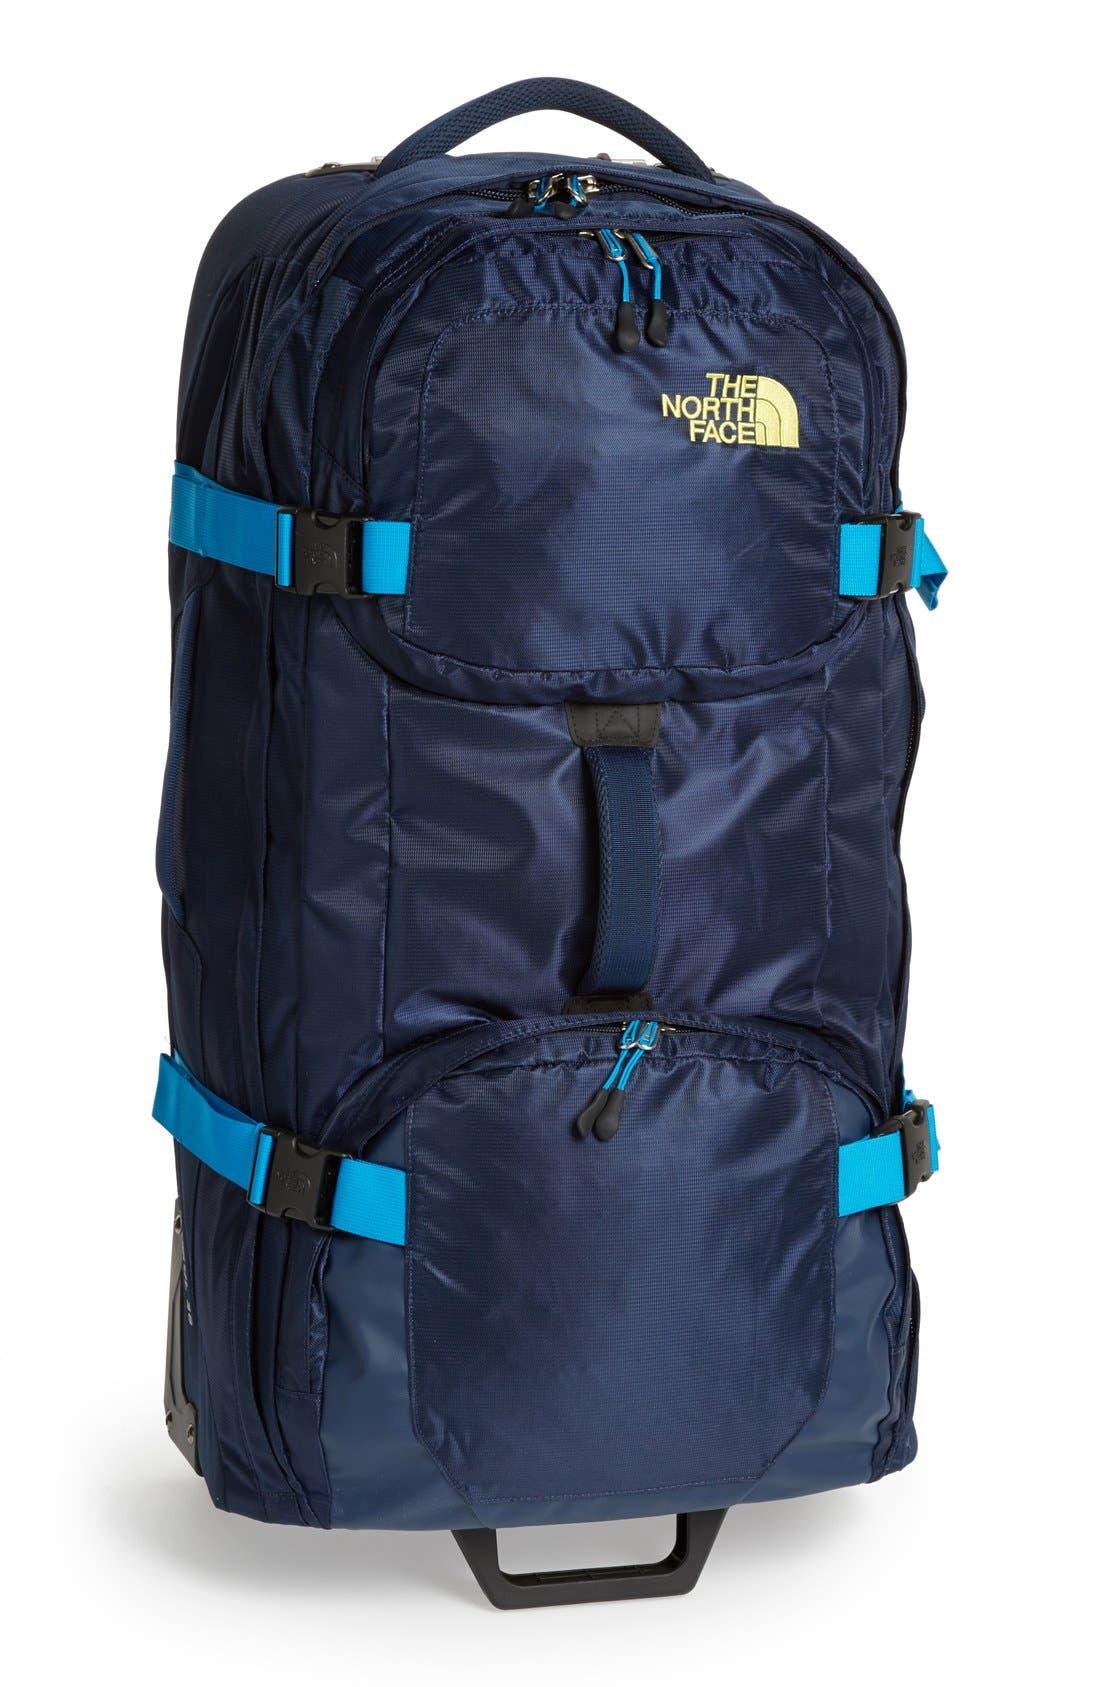 Main Image - The North Face 'Longhaul' Rolling Duffel Bag (30 Inch)